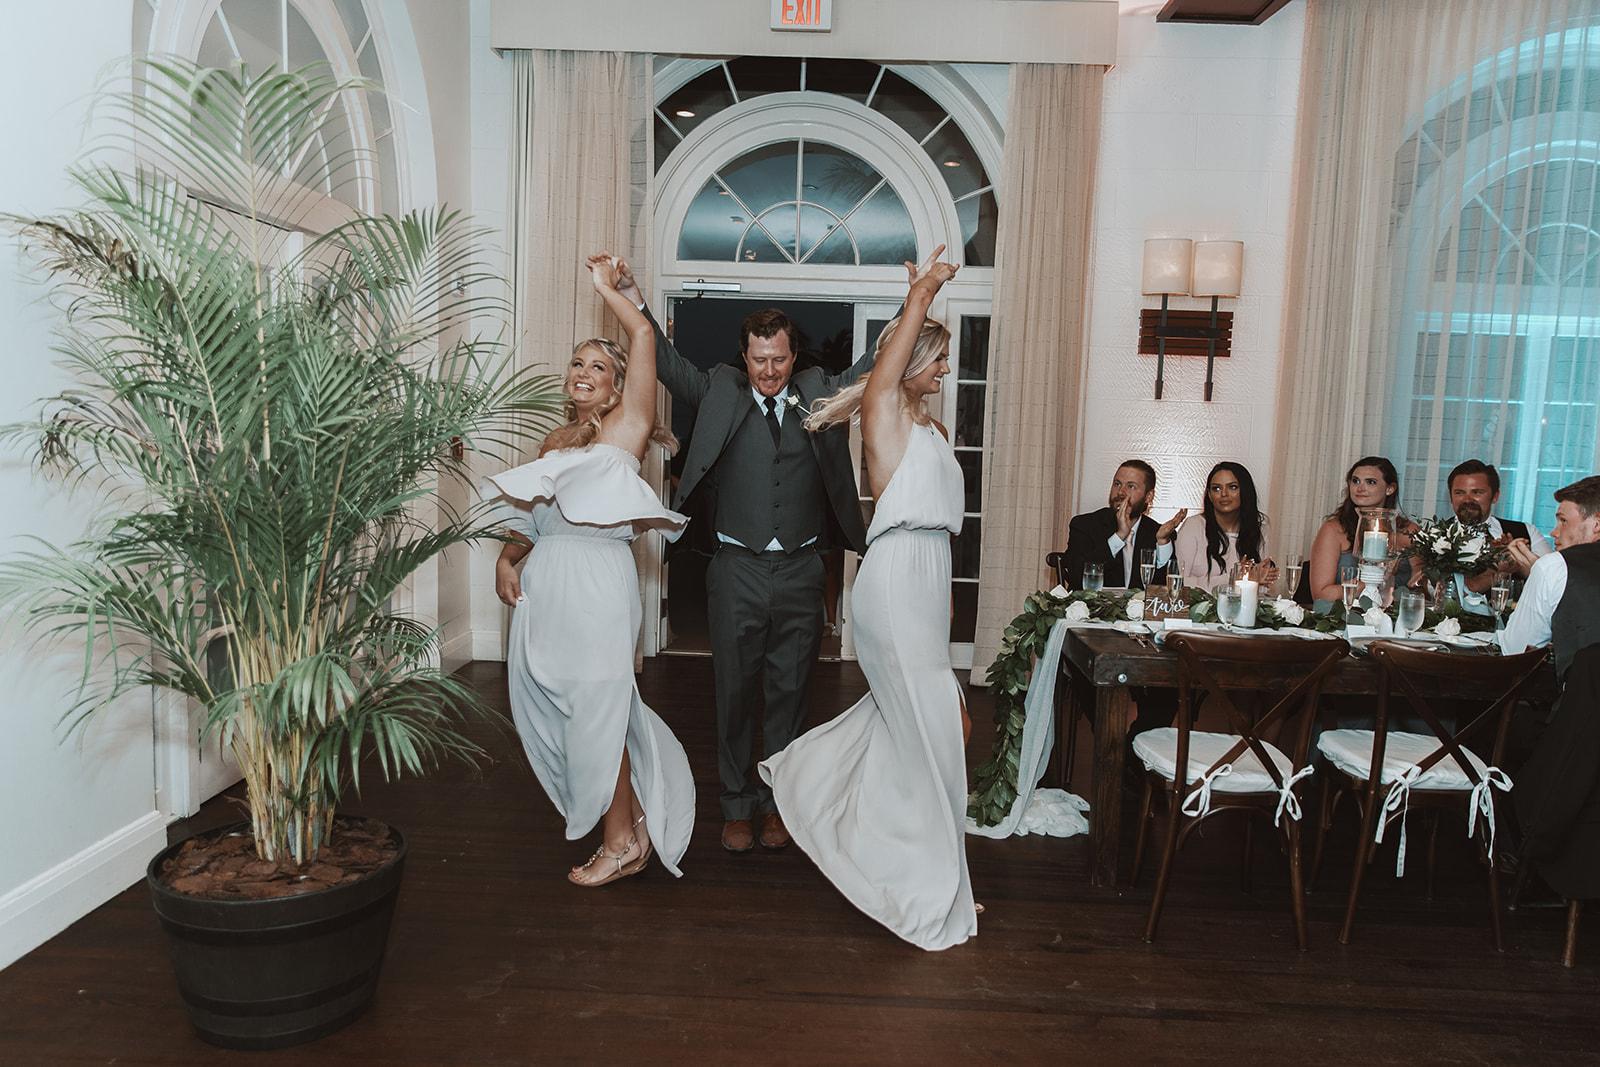 Katye_and_Jason_Wedding-0772.jpg